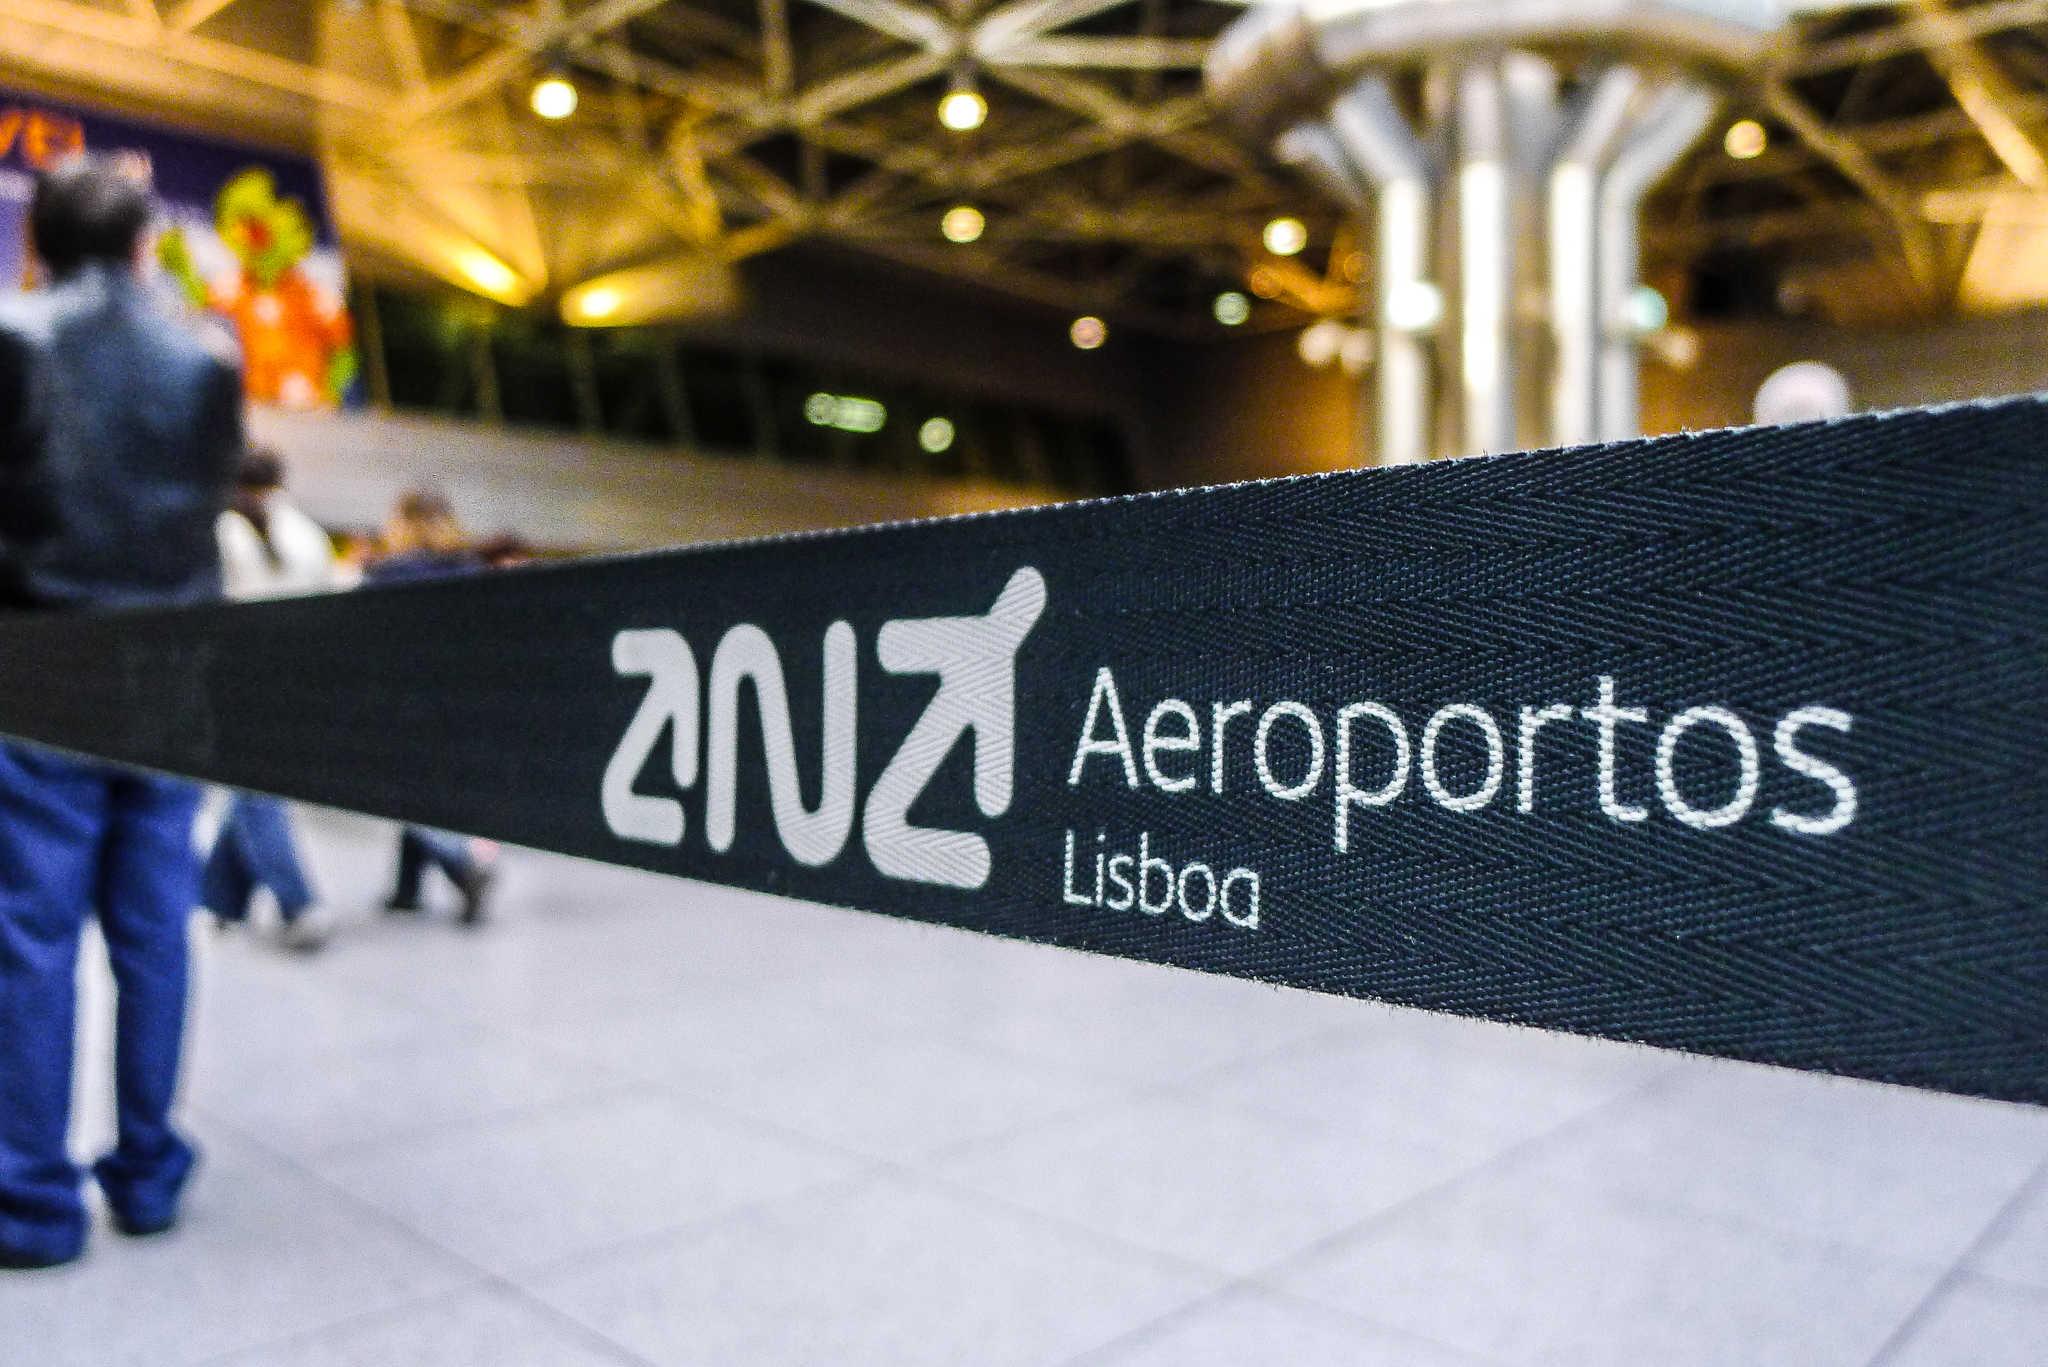 Baia de aeroporto delimitadora de espaços com logotipo da ANA Aeroportos de portugal no aeroporto de Lisboa